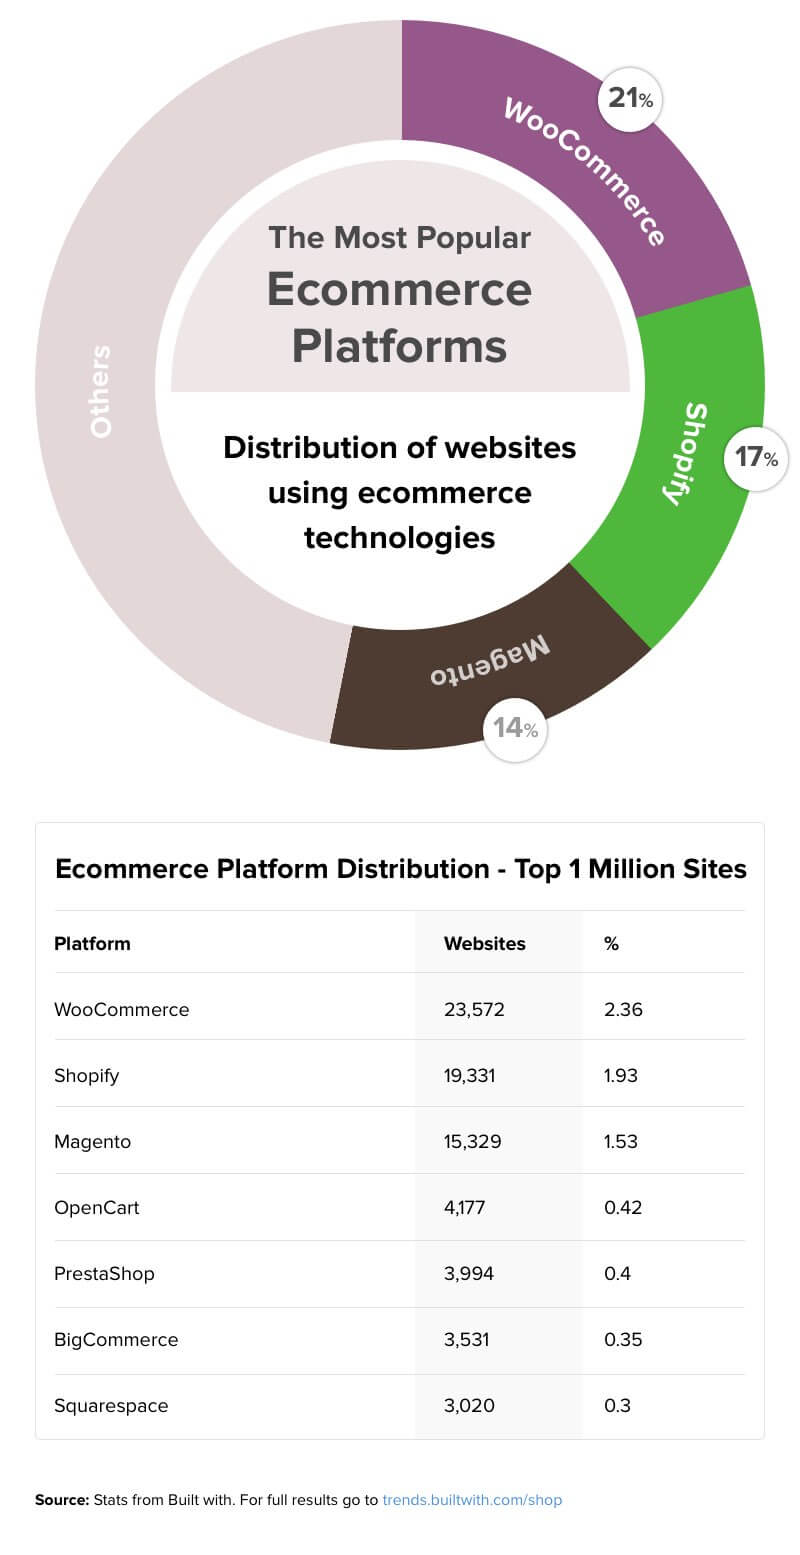 Most Popular Ecommerce Platforms